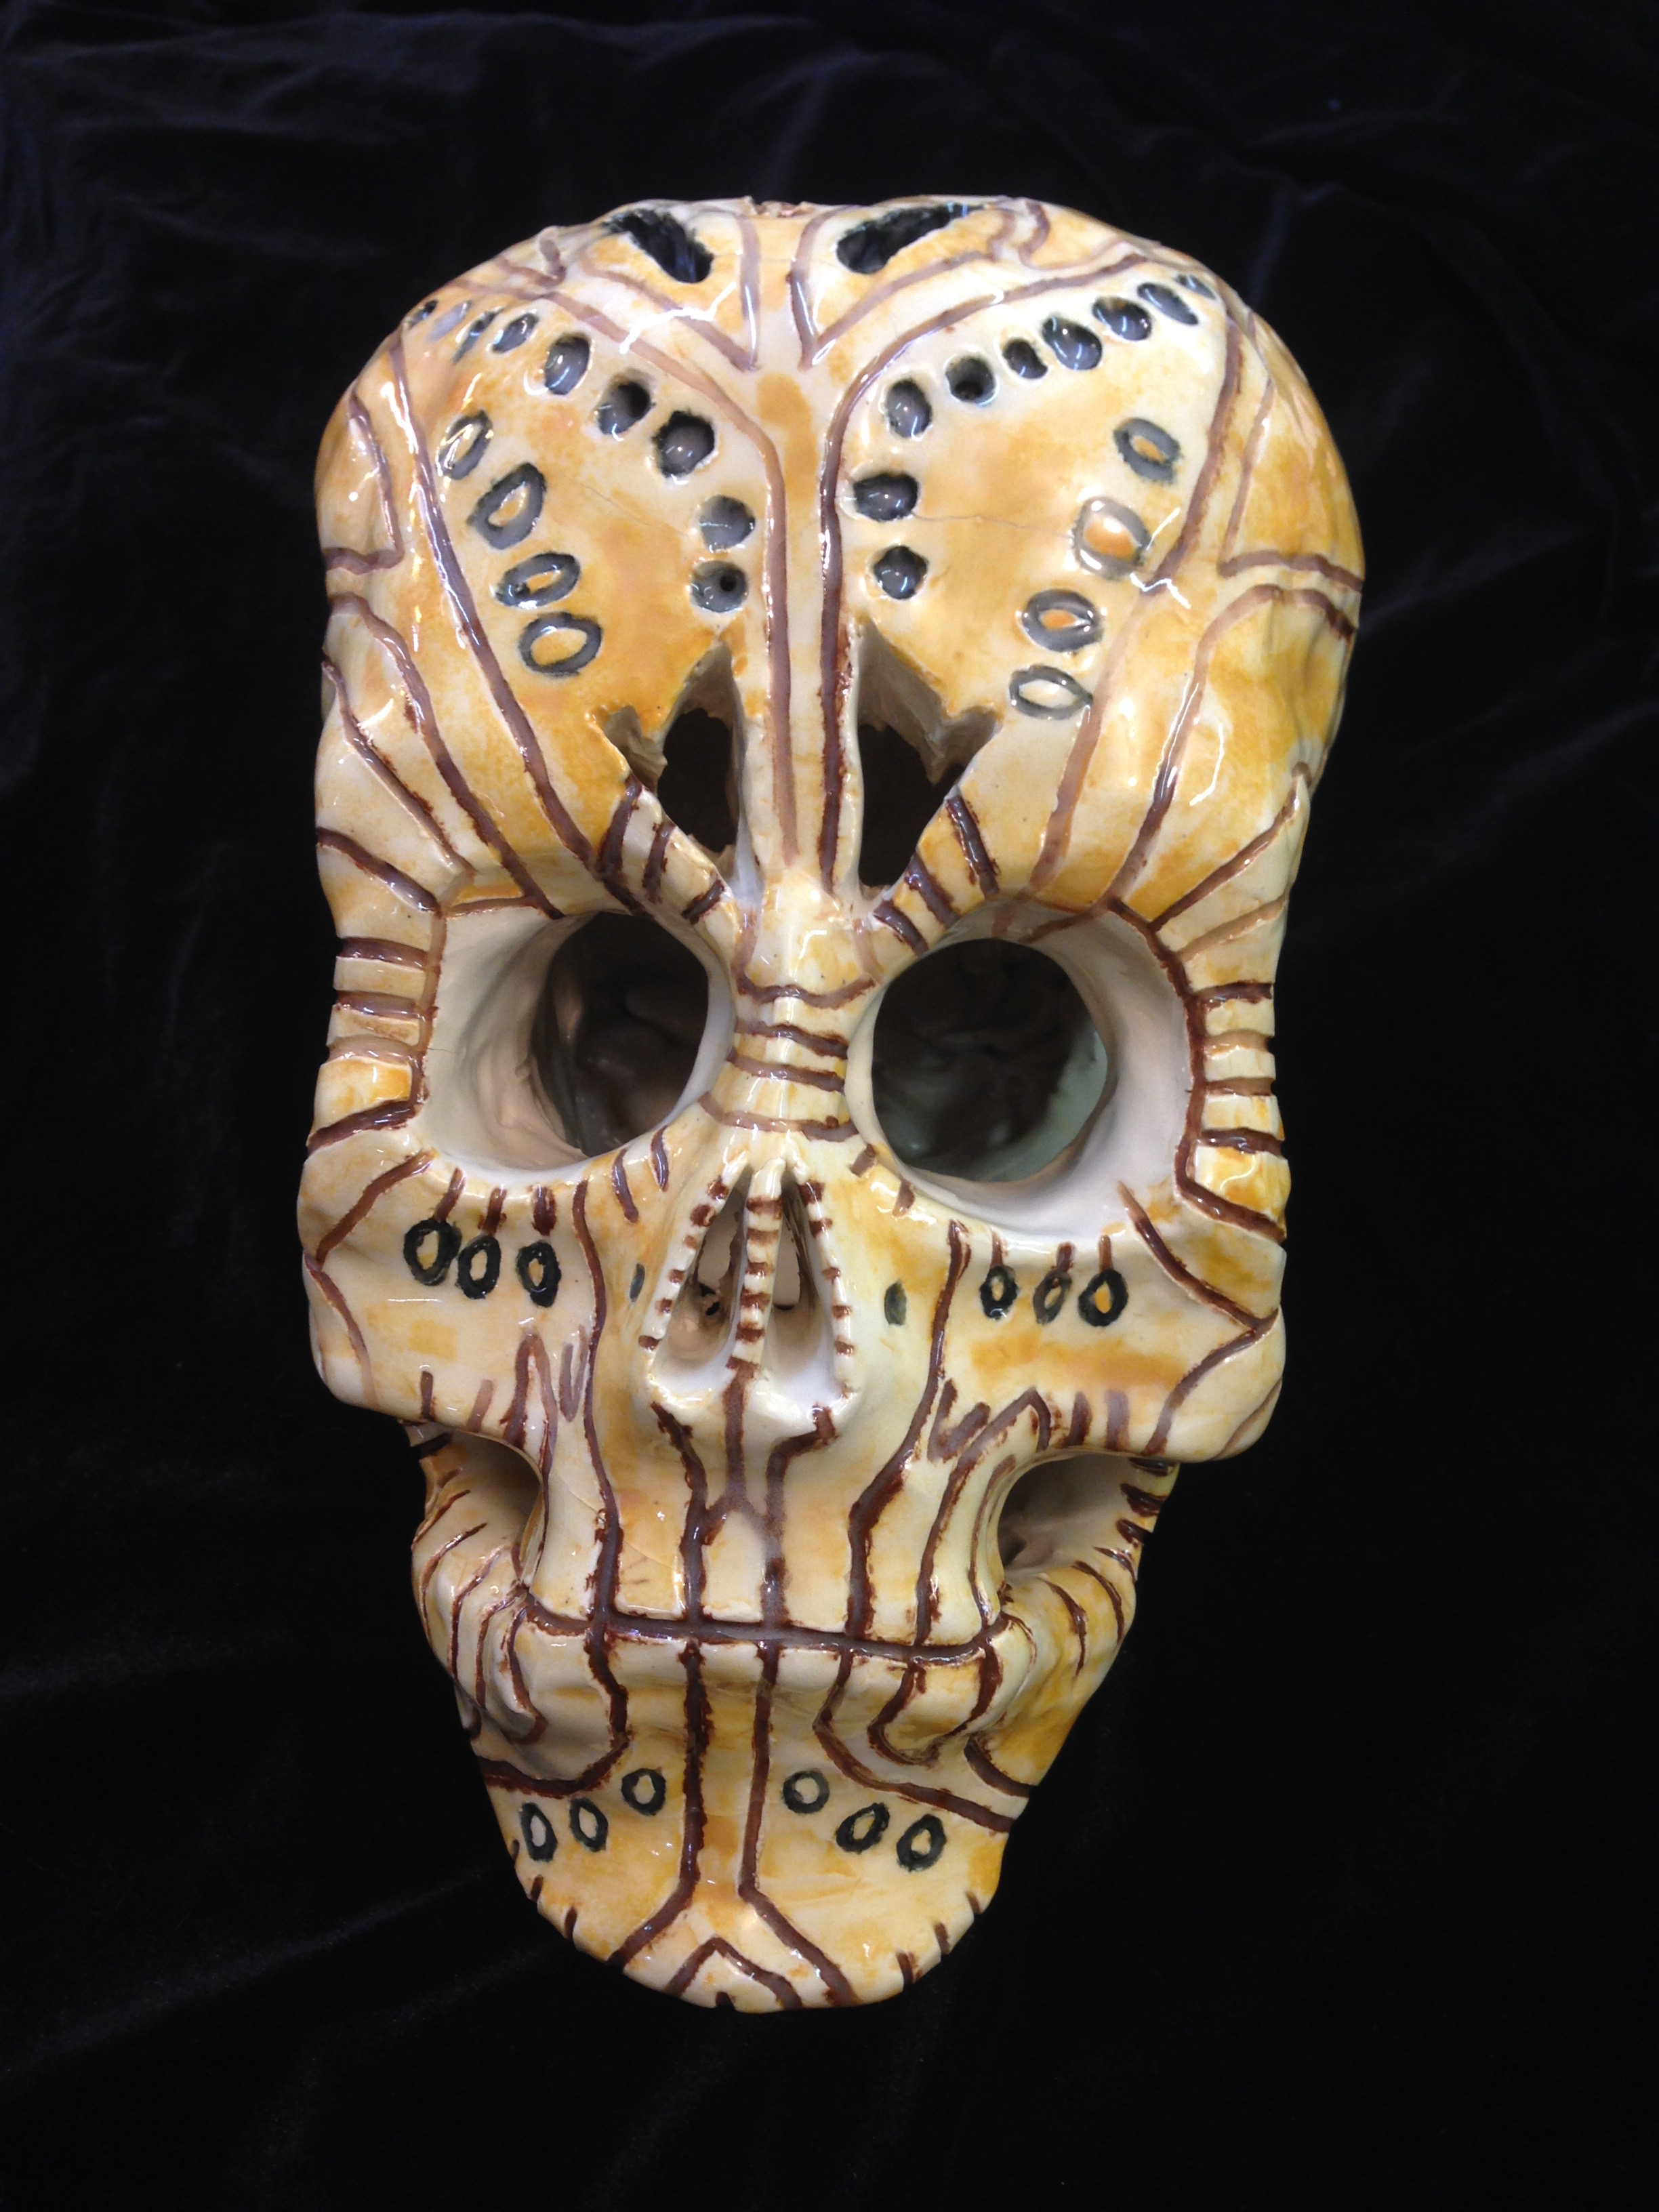 Skull by Ben